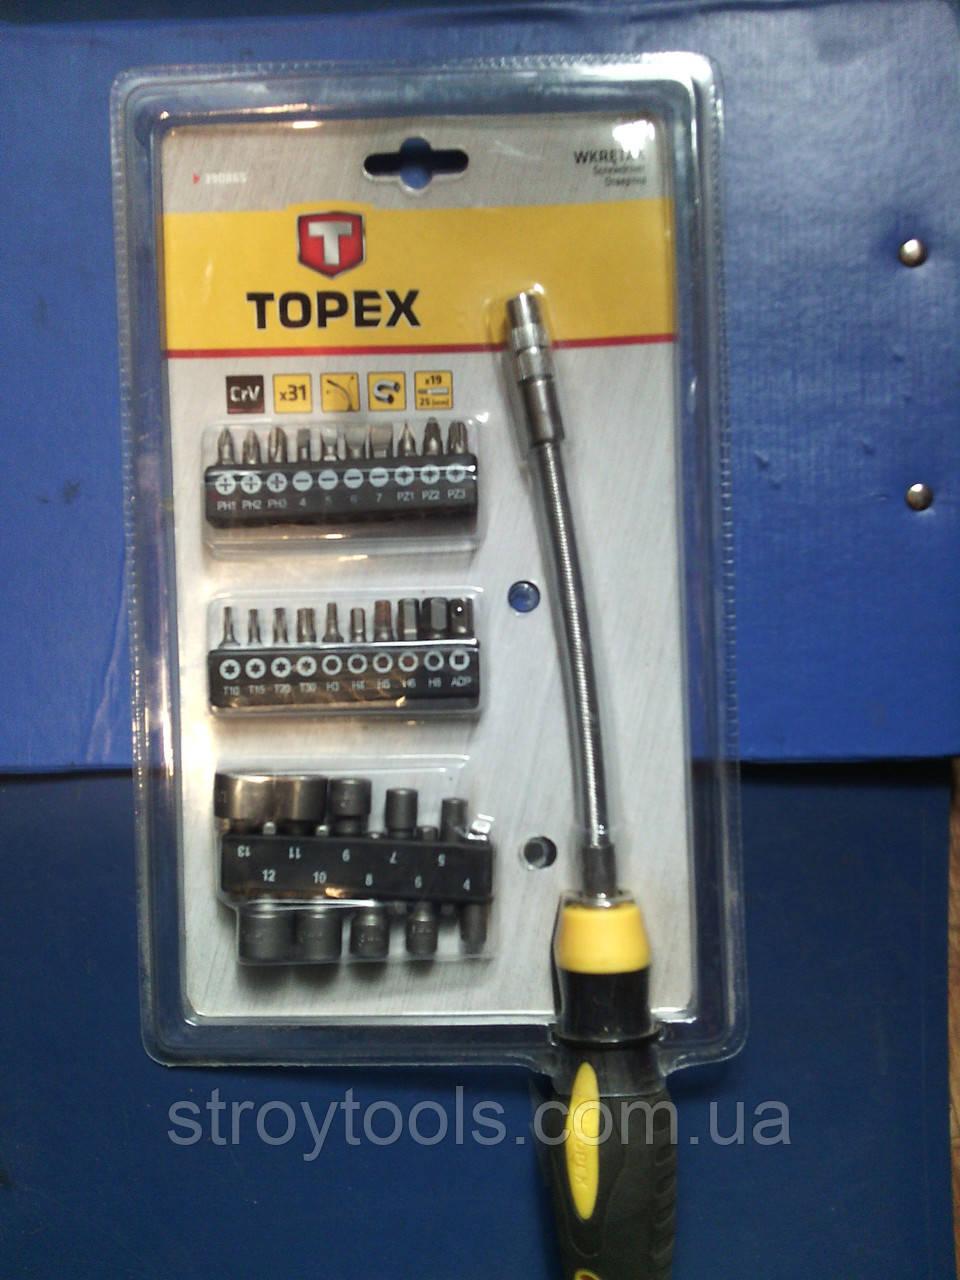 Отвертка TOPEX 39D865  с гибким стержнем намагничена с набором насадок 31шт.Киев.